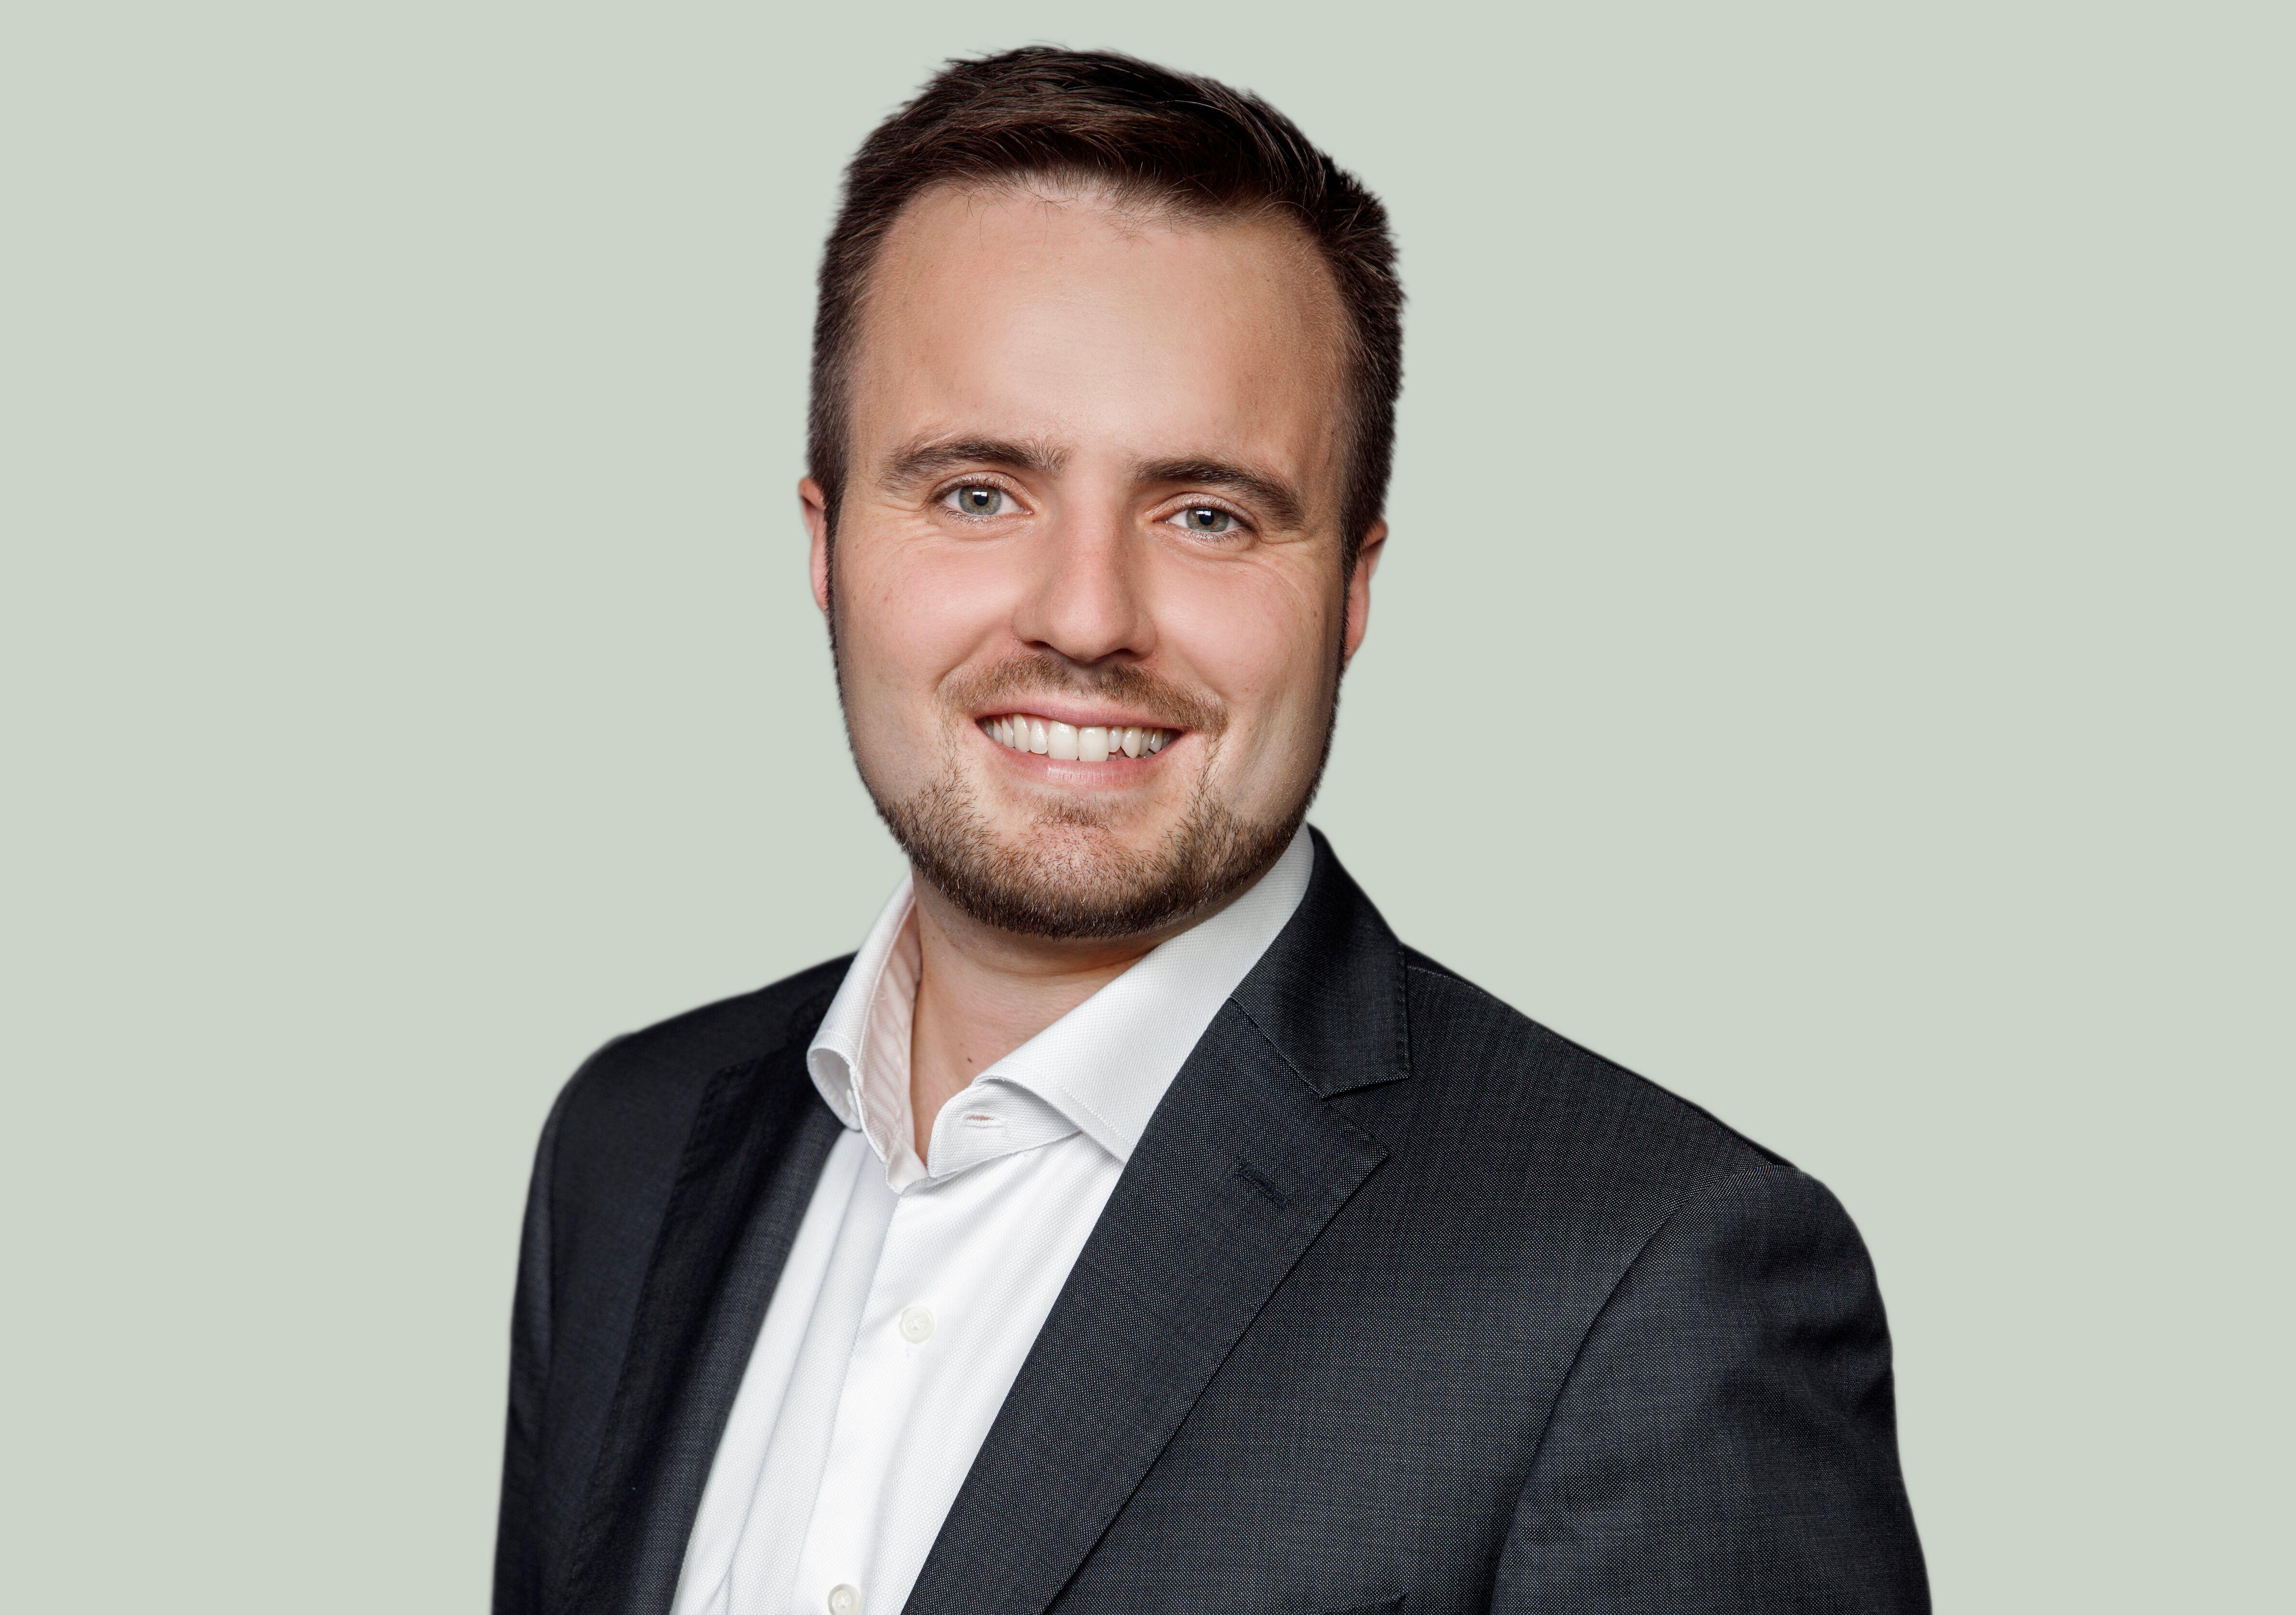 Simon Kollerup er Danmarks nye erhvervsminister, og dermed også minister for dansk turisme. Pressefoto: Socialdemokratiet, Partikontoret.